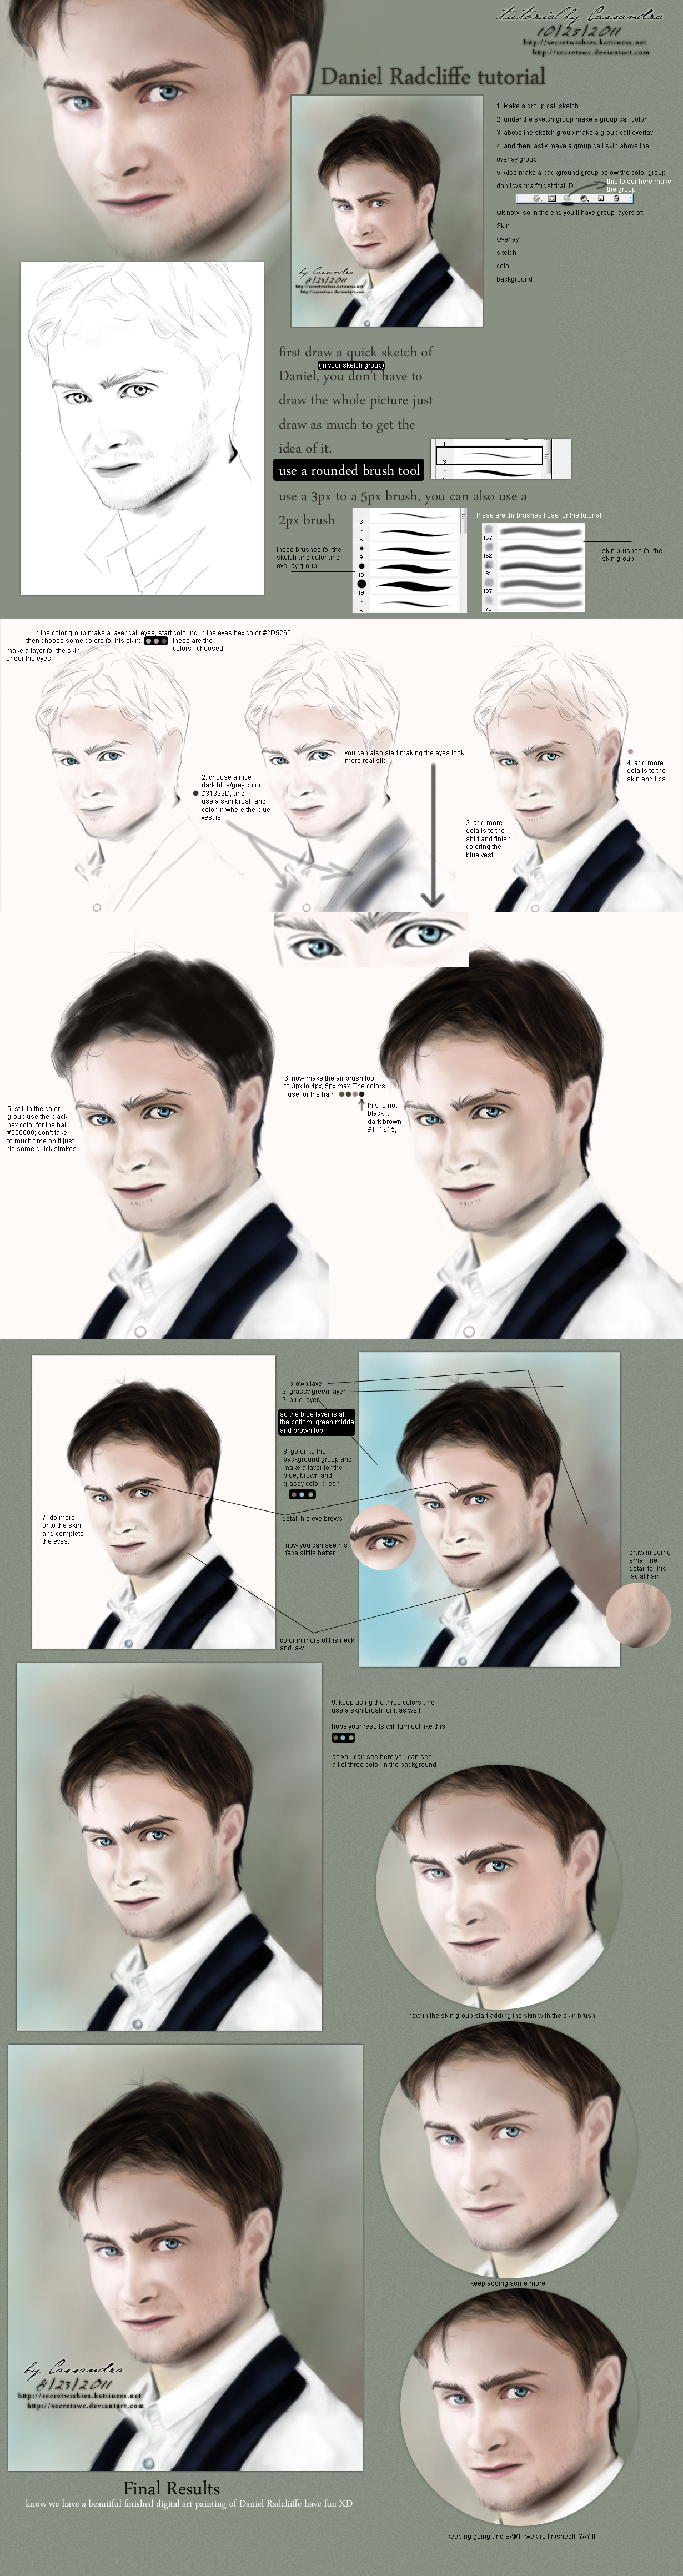 Daniel Radcliffe Tutorial by secretSWC